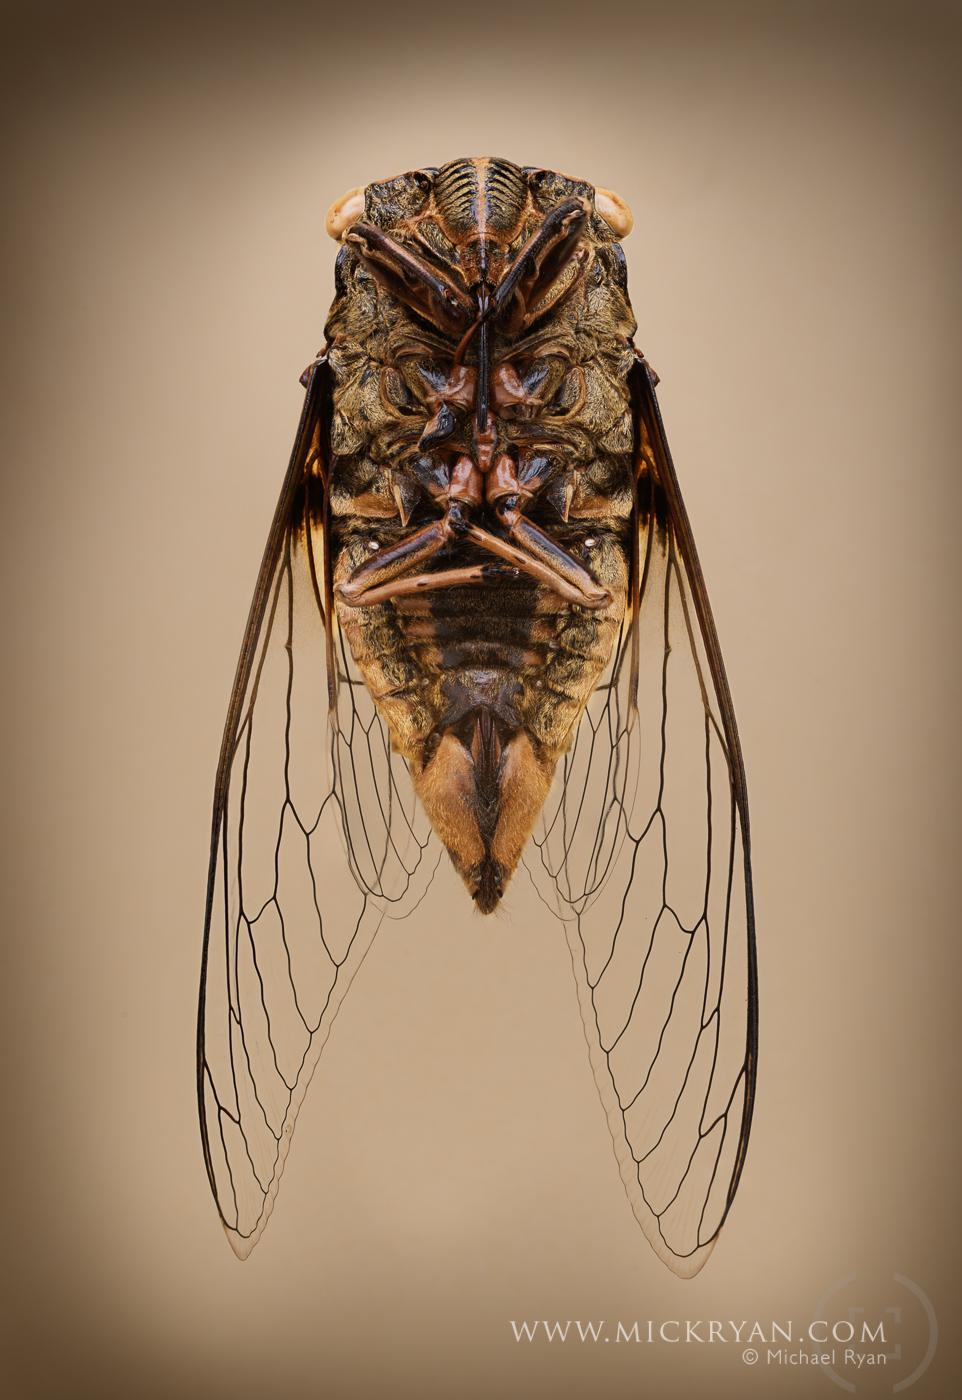 Cicada wings spread-3209-Edit.jpg